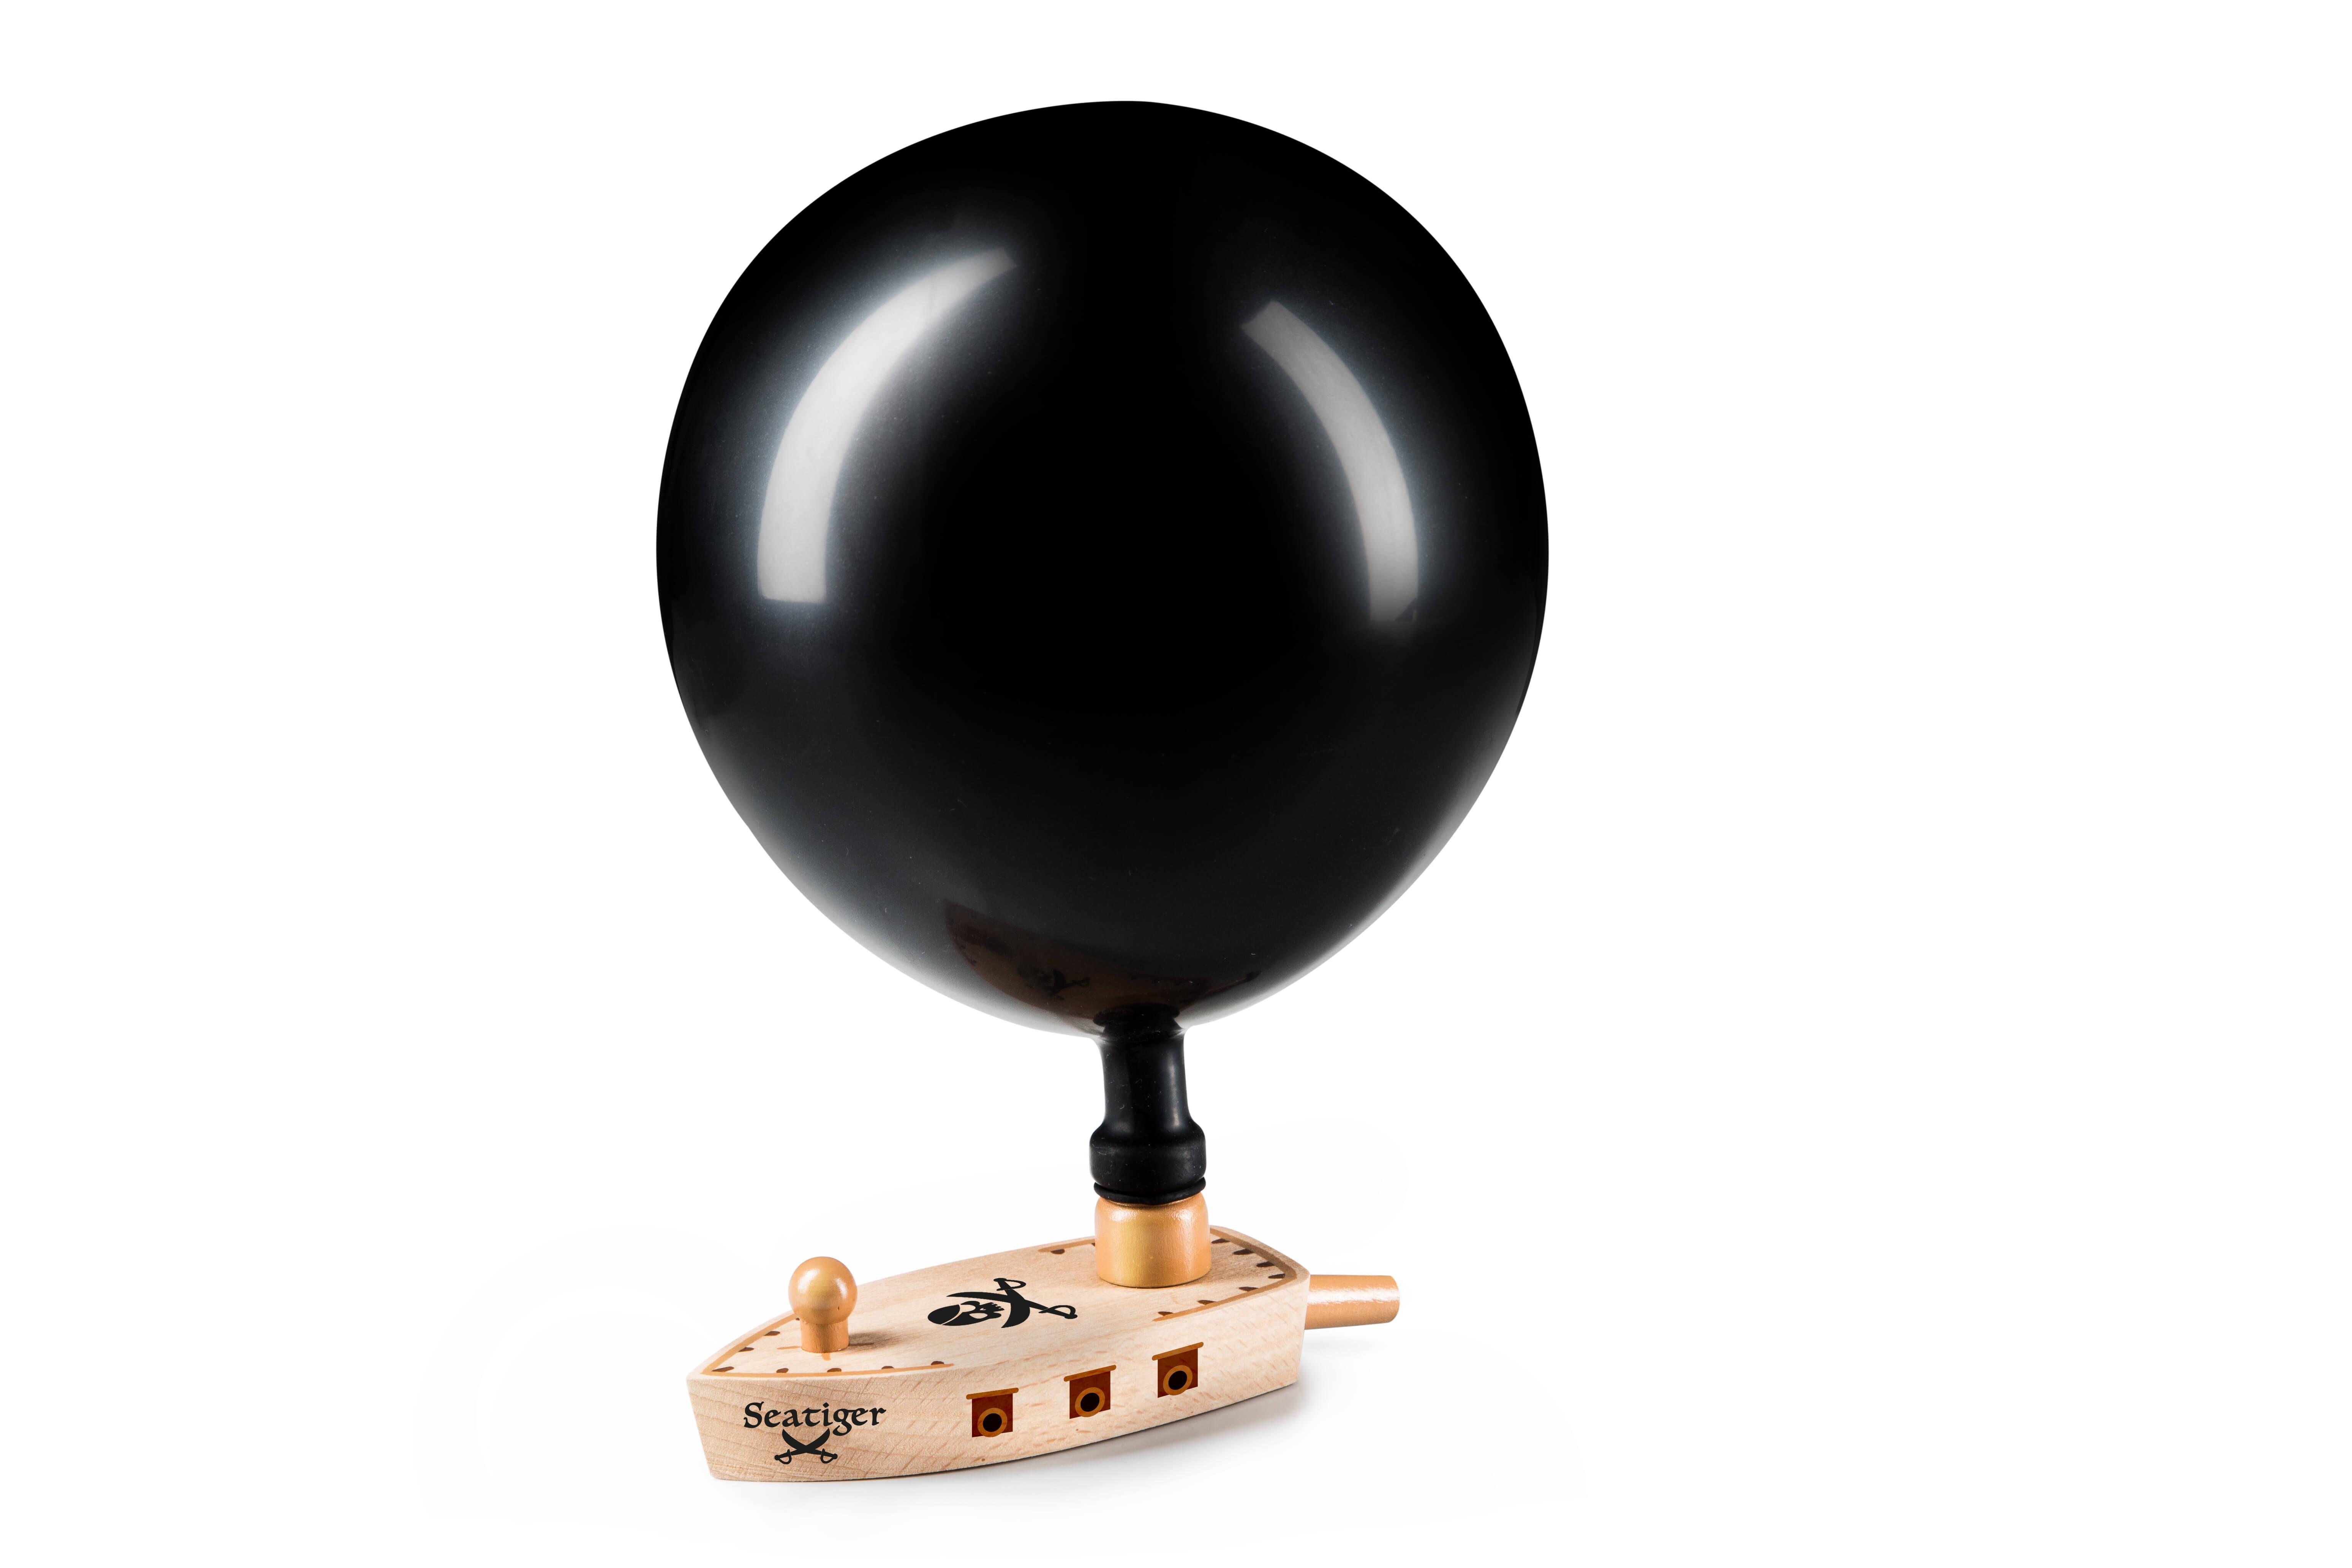 Donkey - Balloon Boat Roaster Boat - Seatiger (900209)